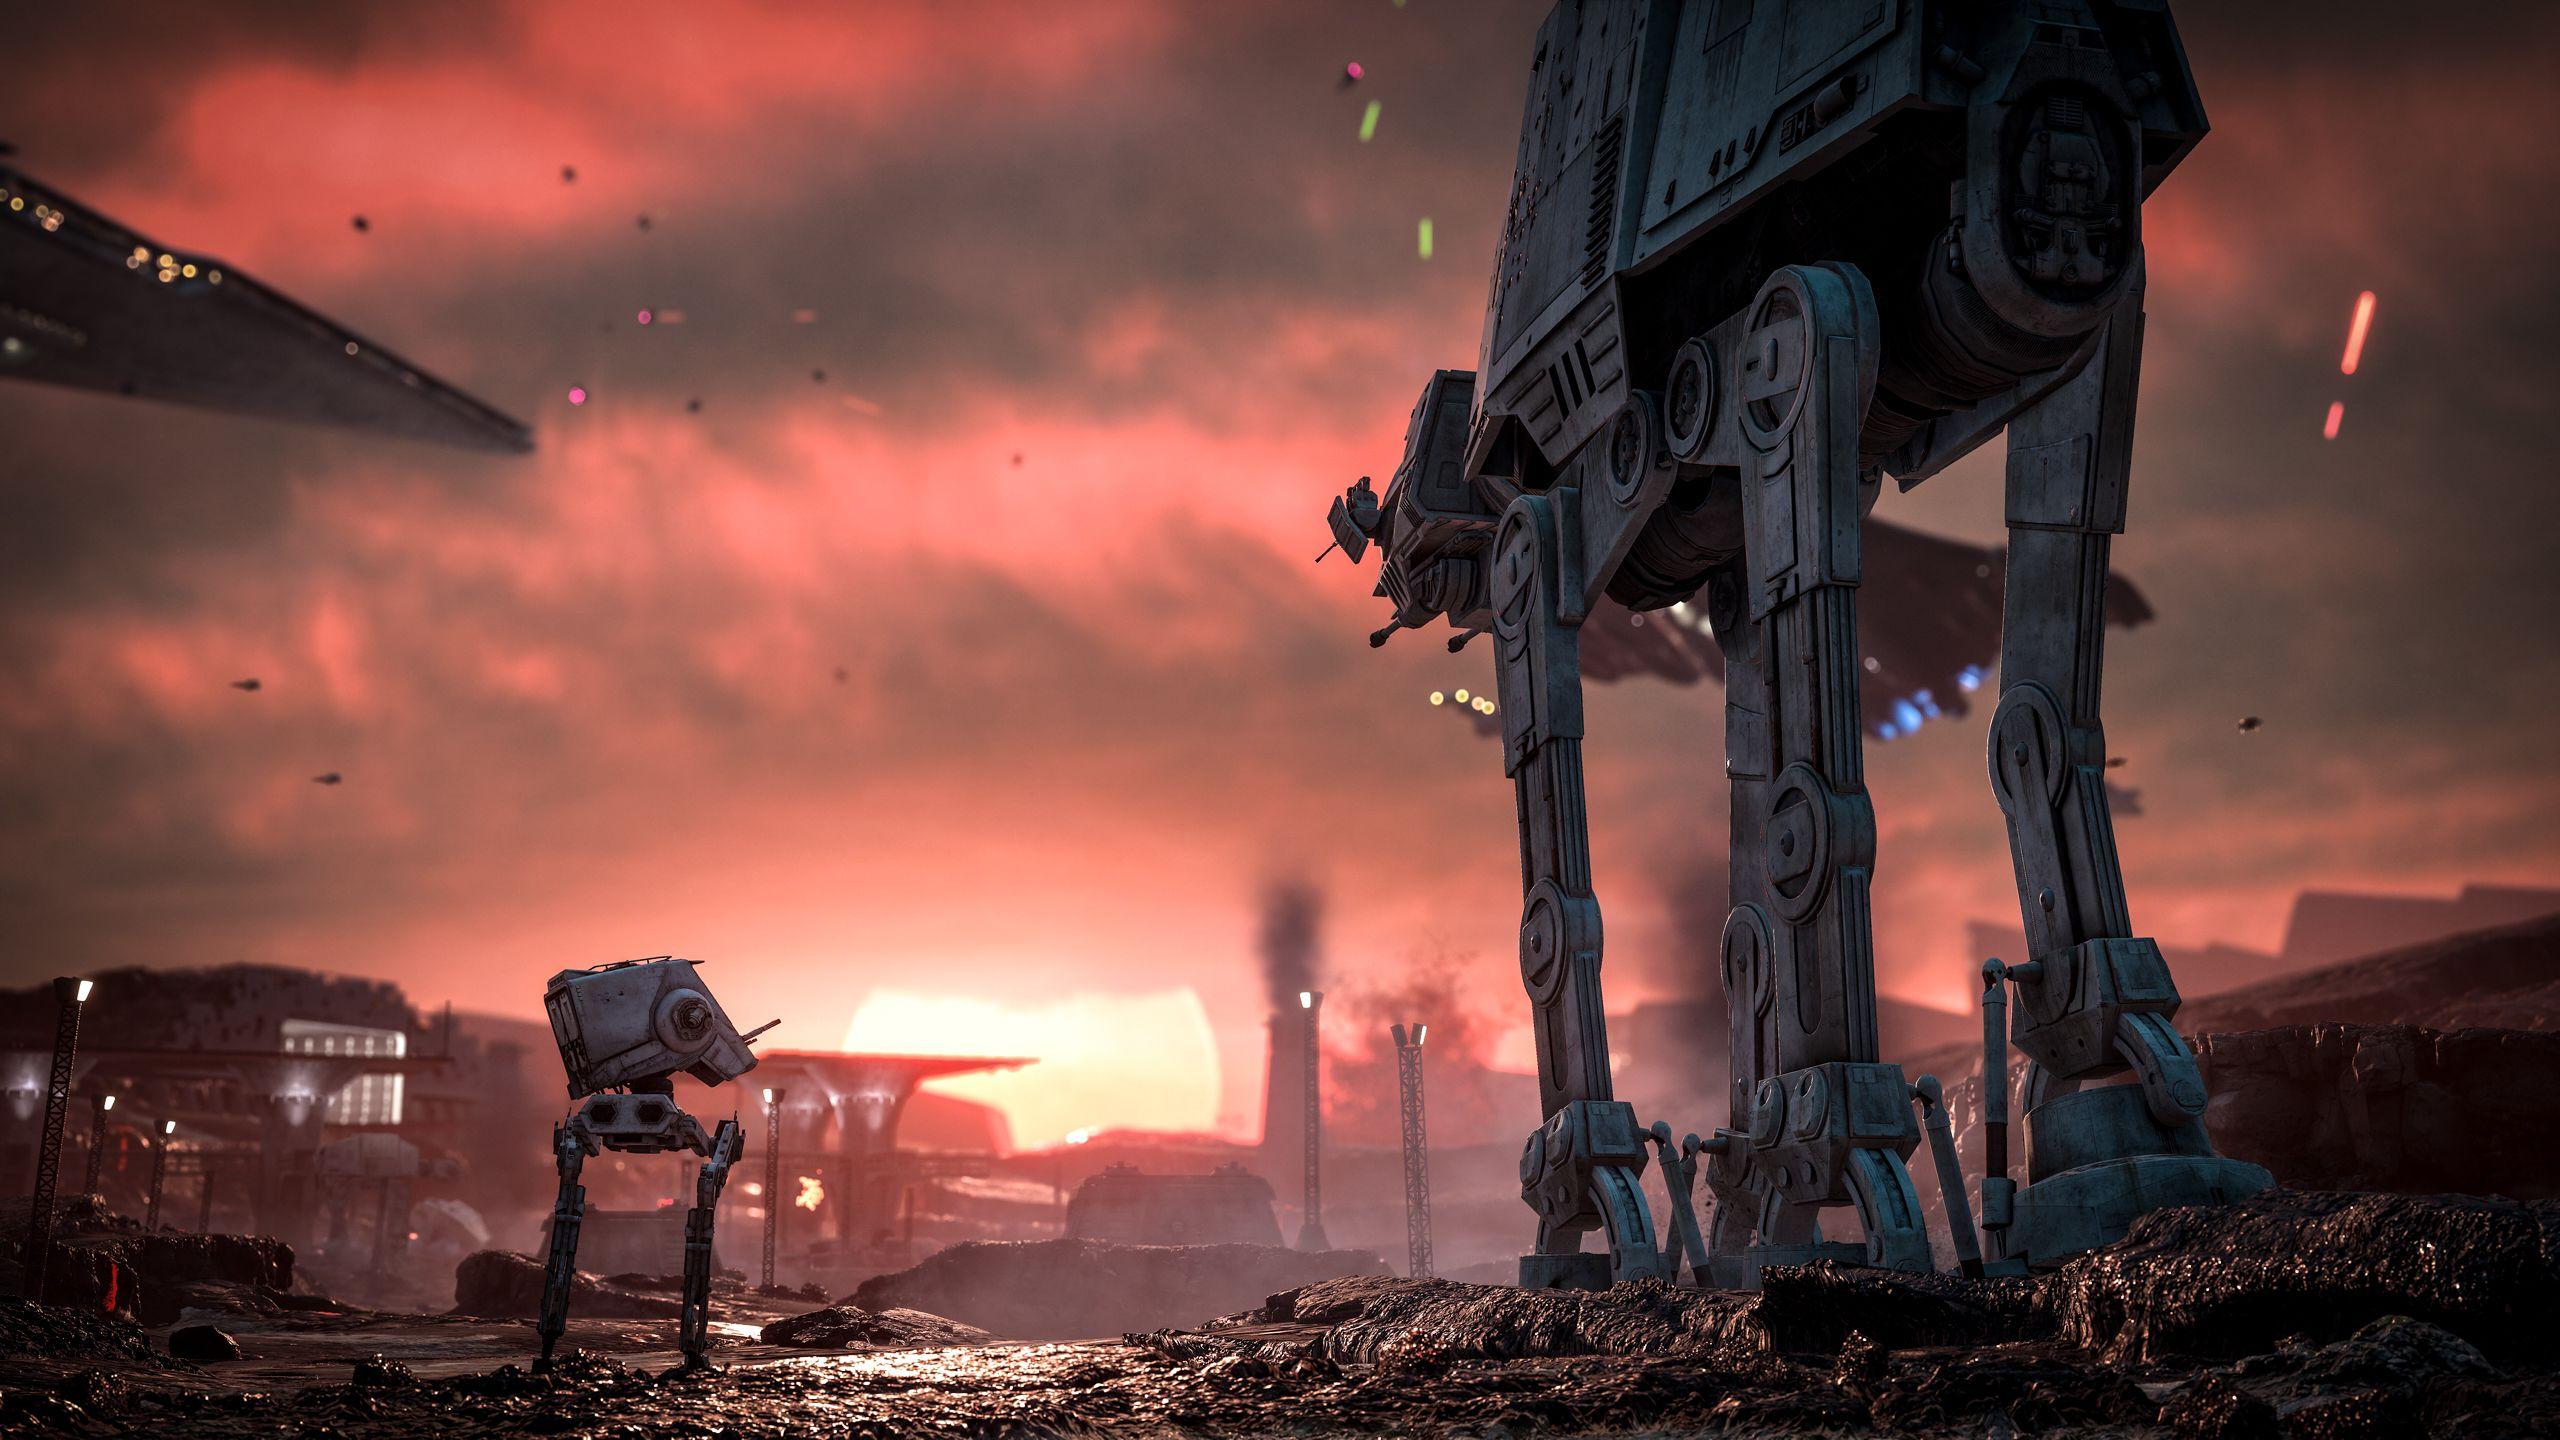 star wars battlefront outer rim dlc trailer | feed4gamers